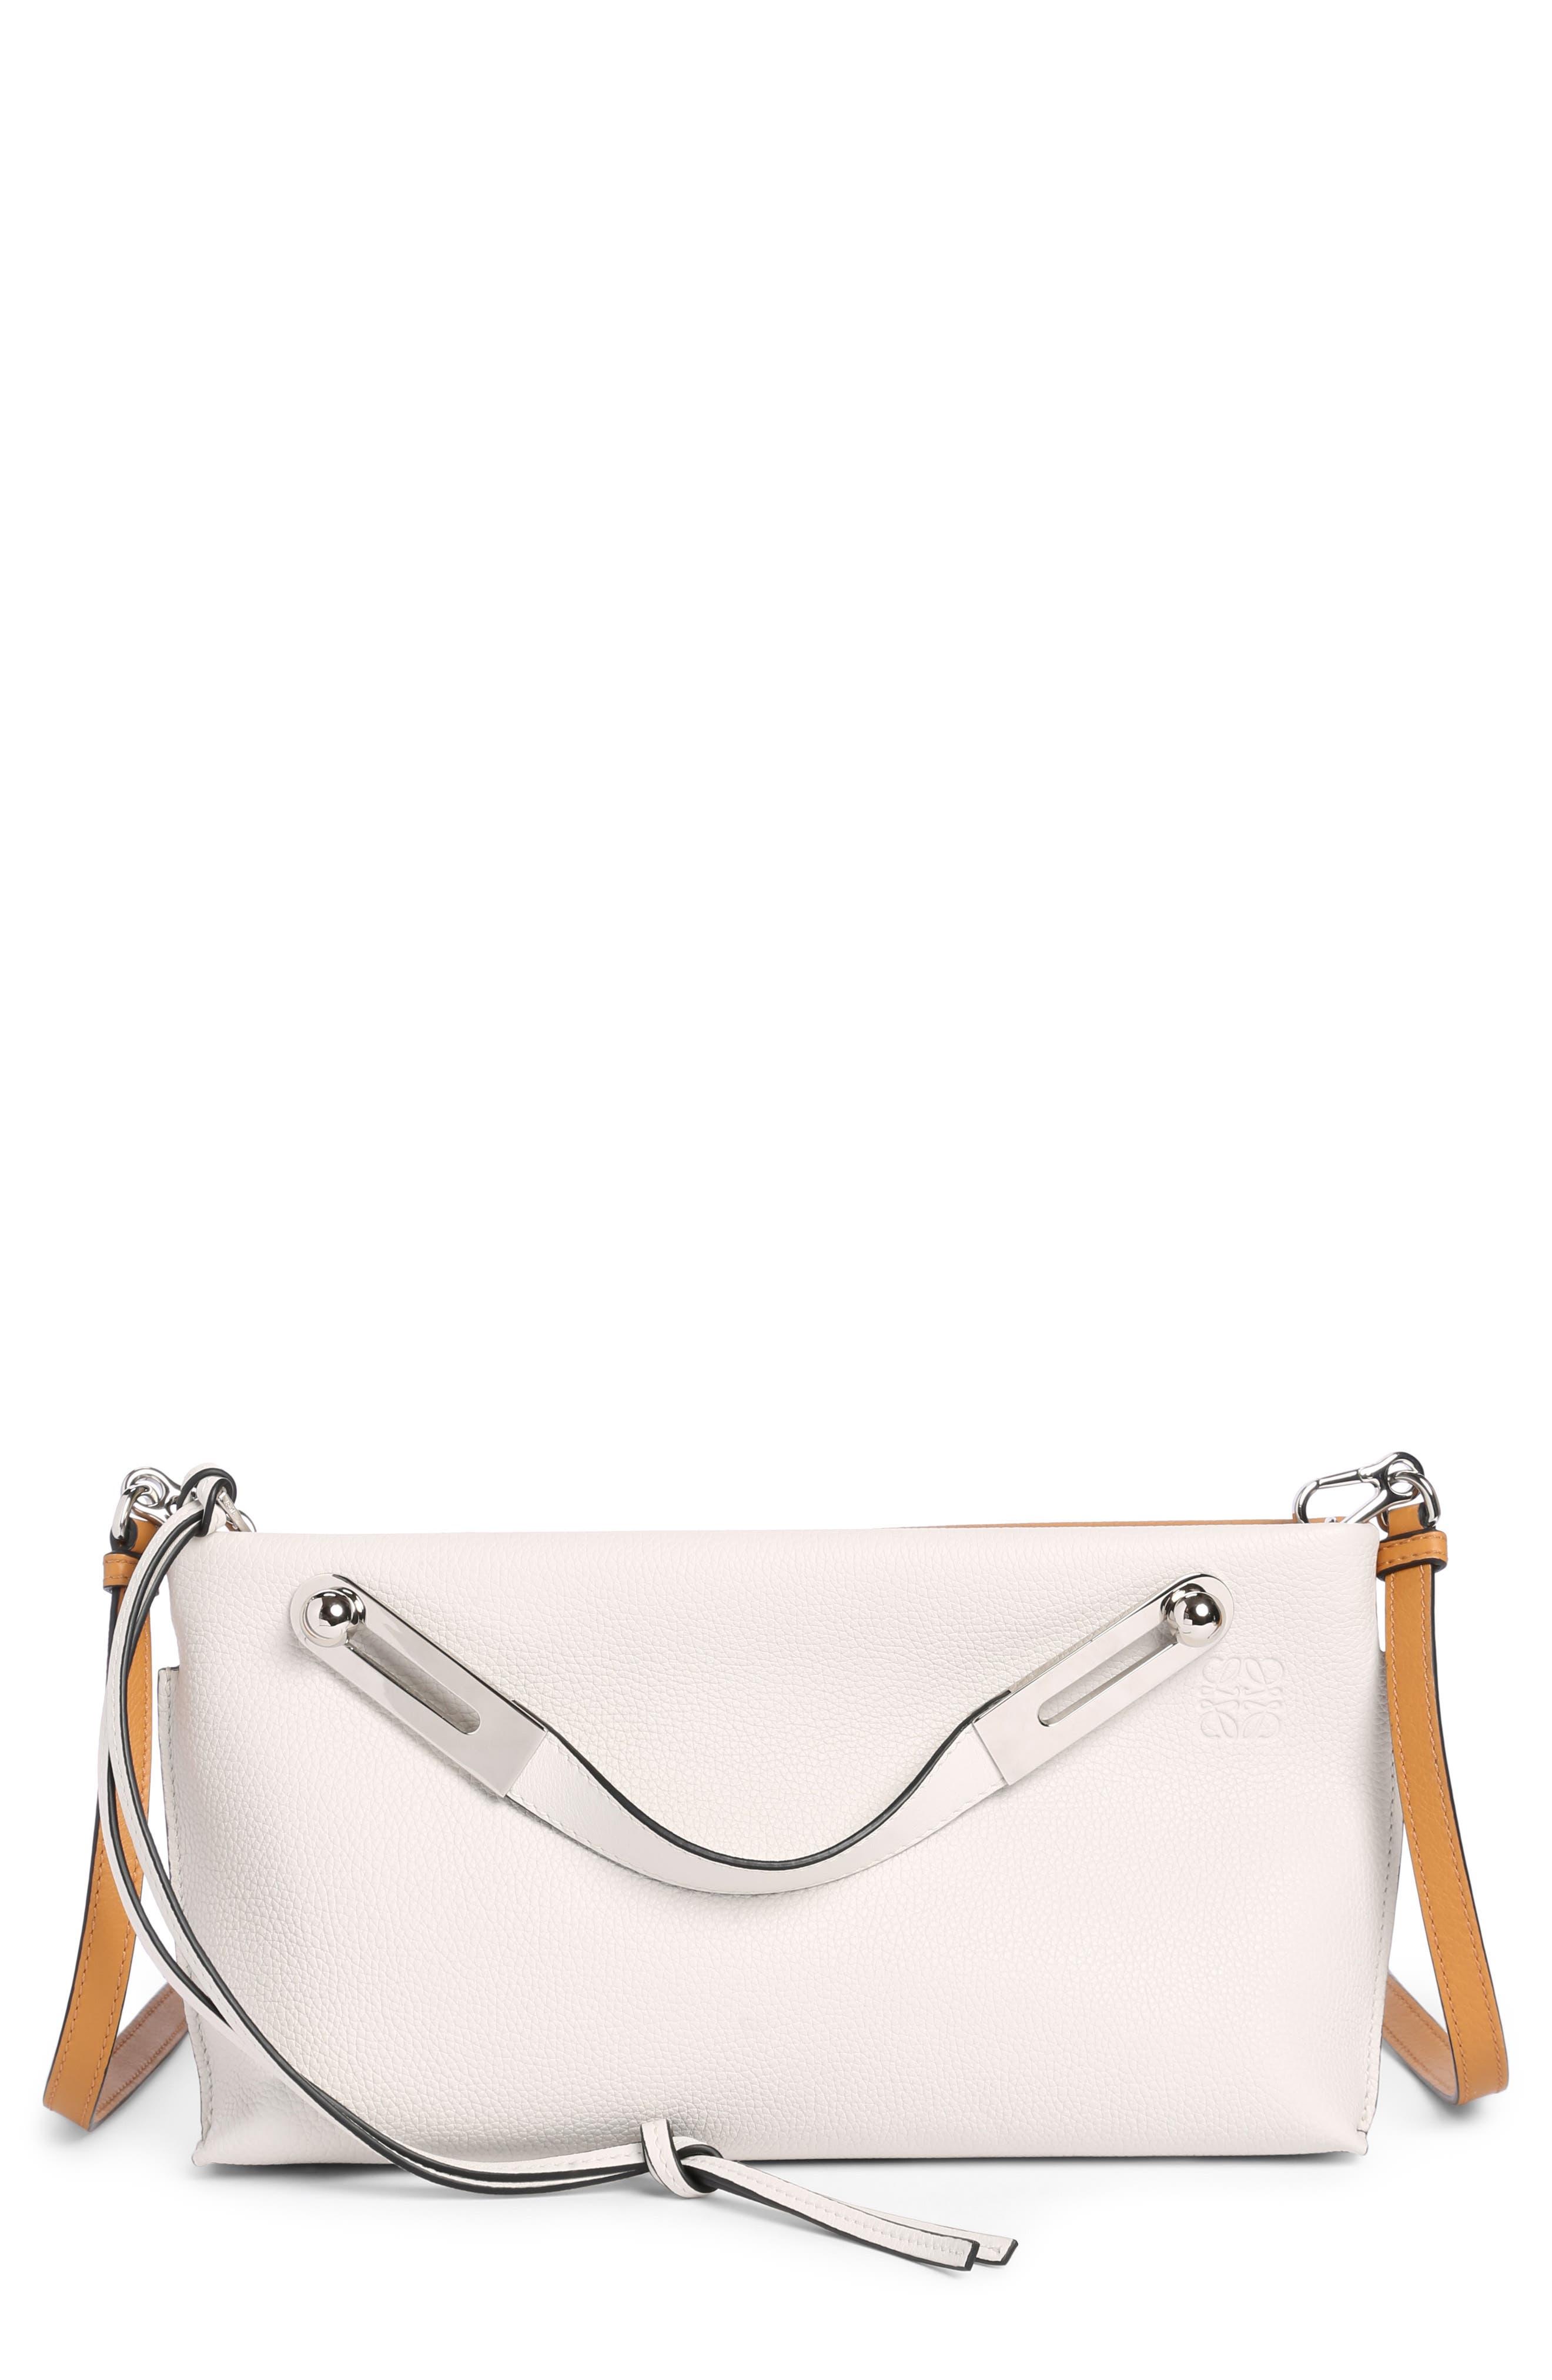 Loewe Small Missy Calfskin Leather Crossbody Bag